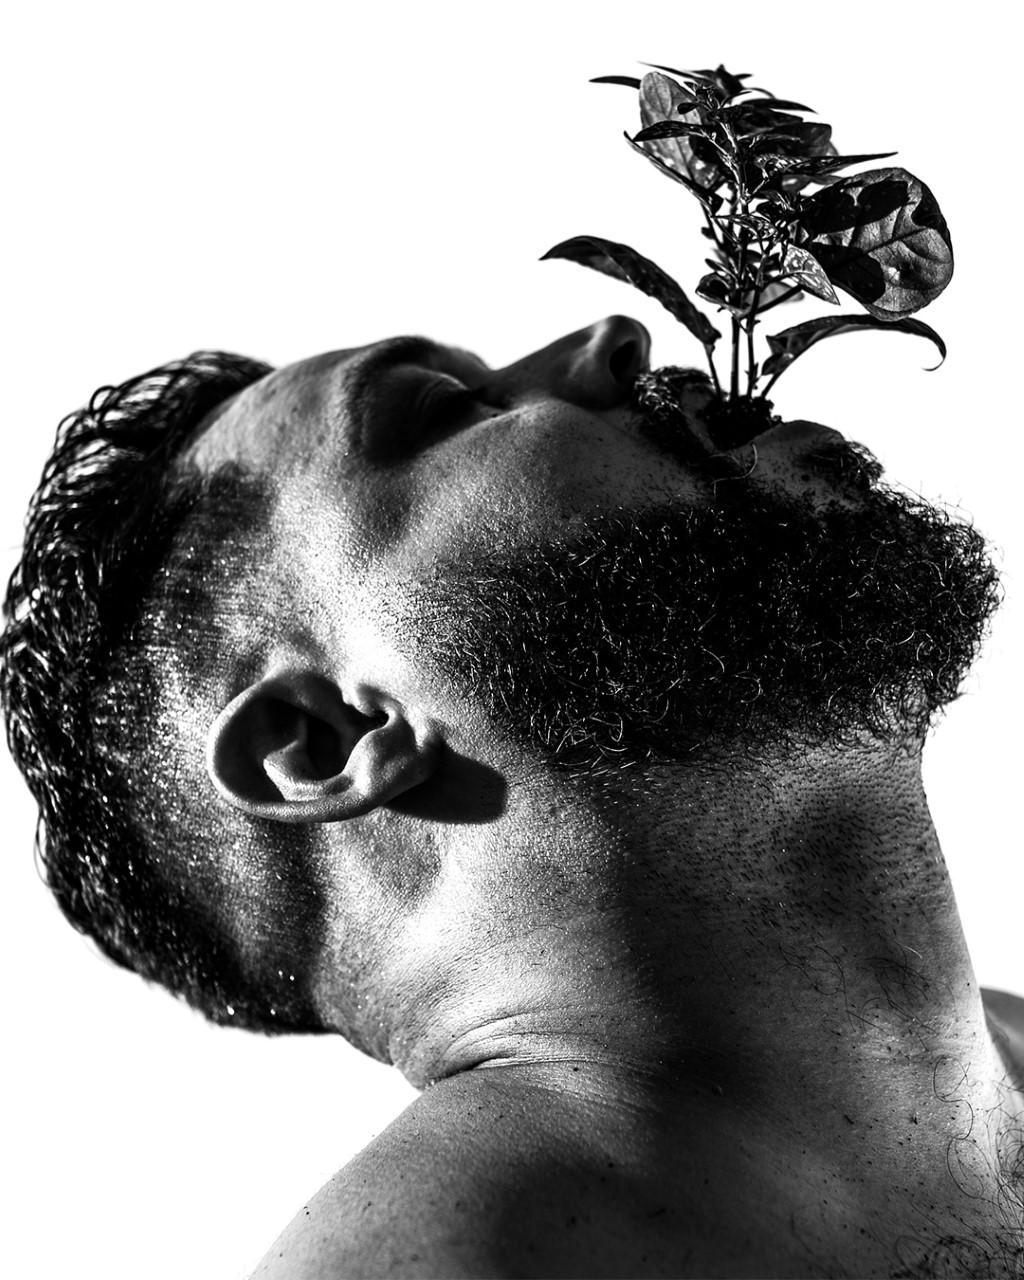 El artista granadino David Bastidas estrena mañana su primer single 'Hope there´s someone'